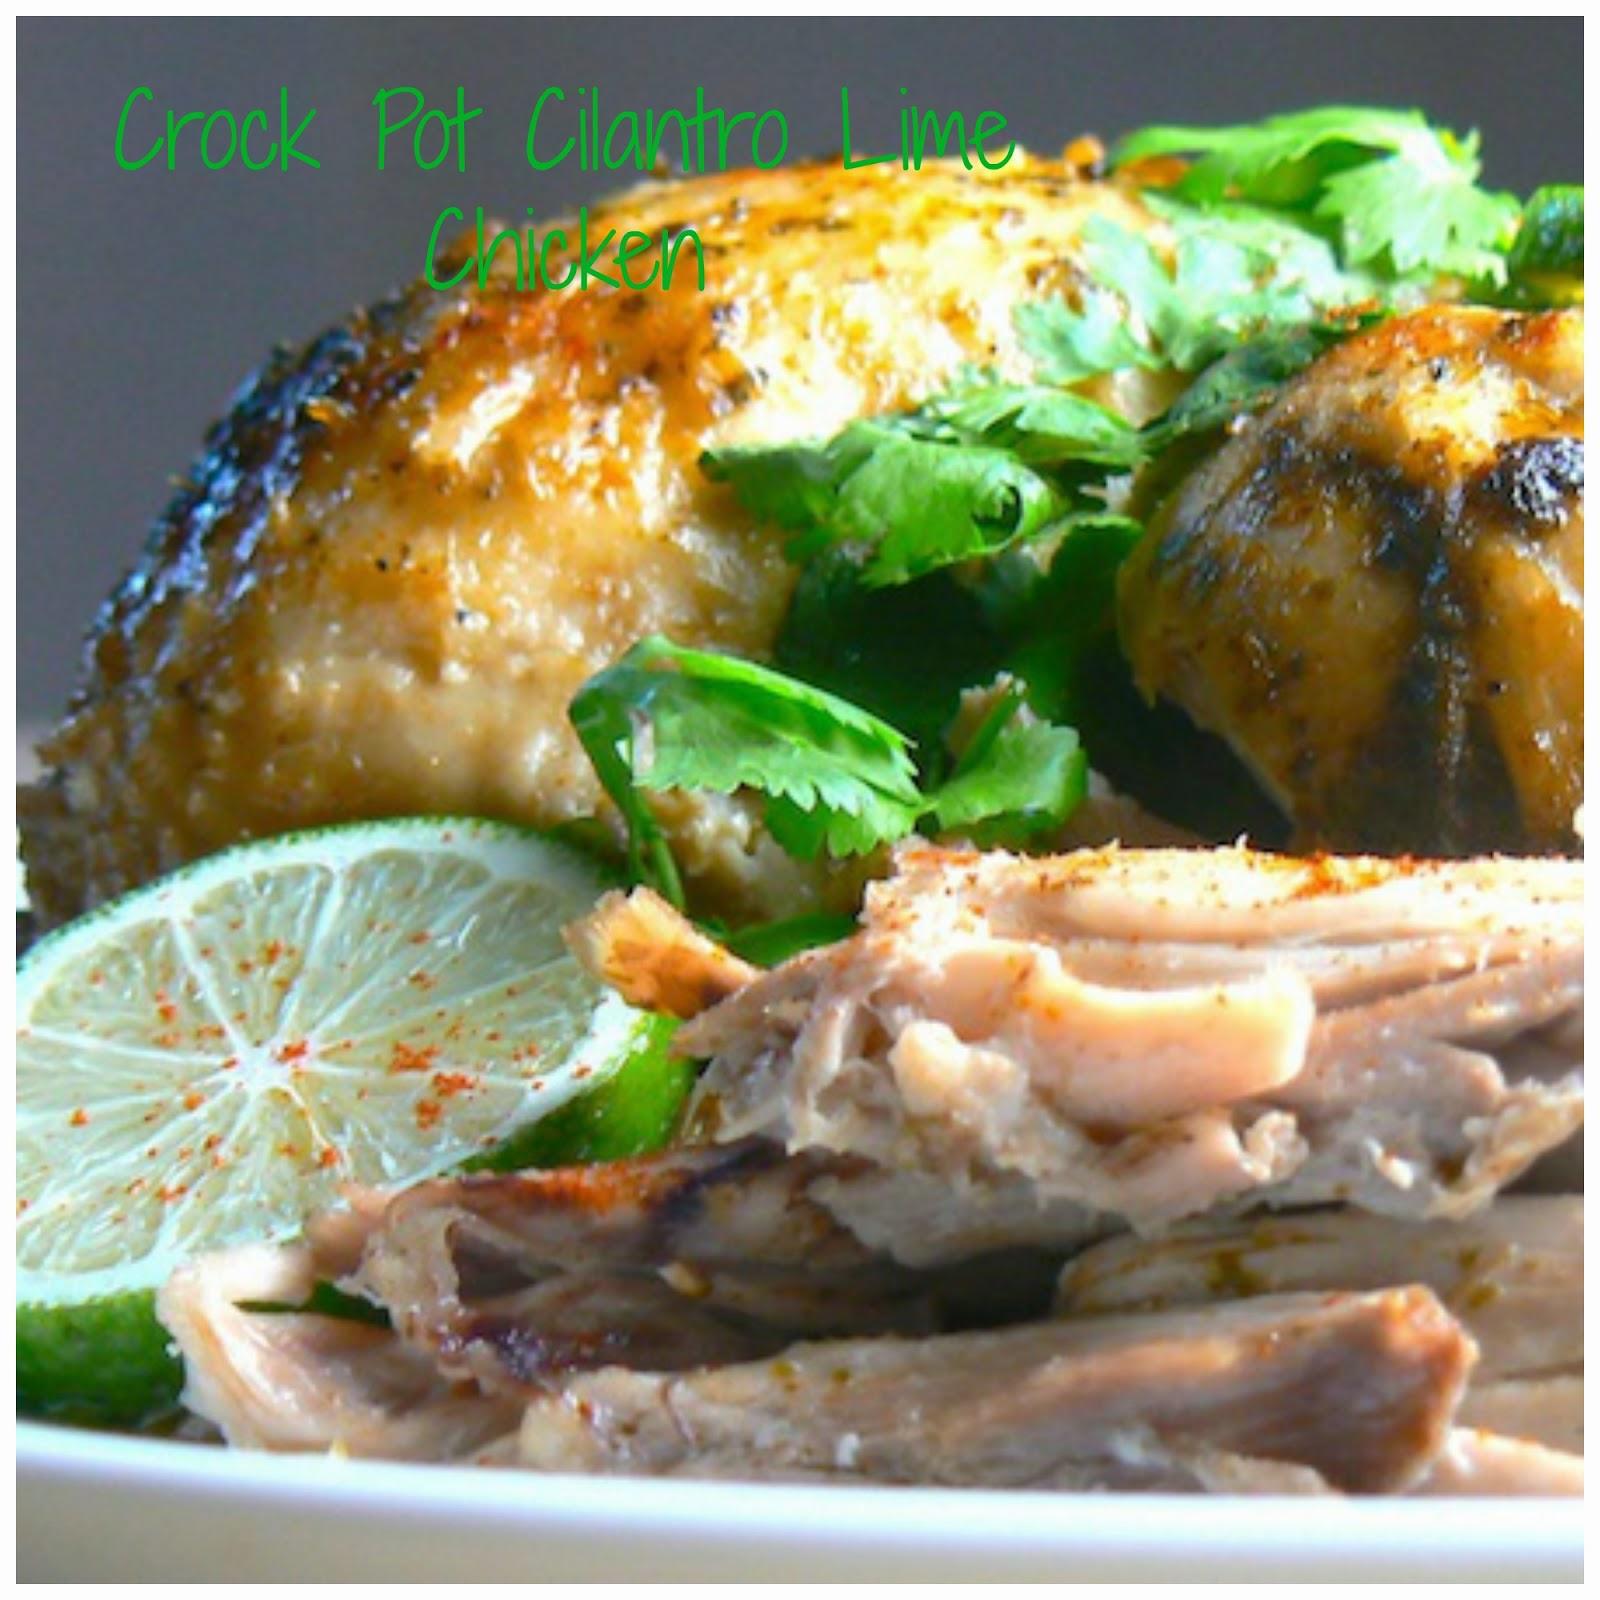 Crock pot Cilantro Lime Chicken